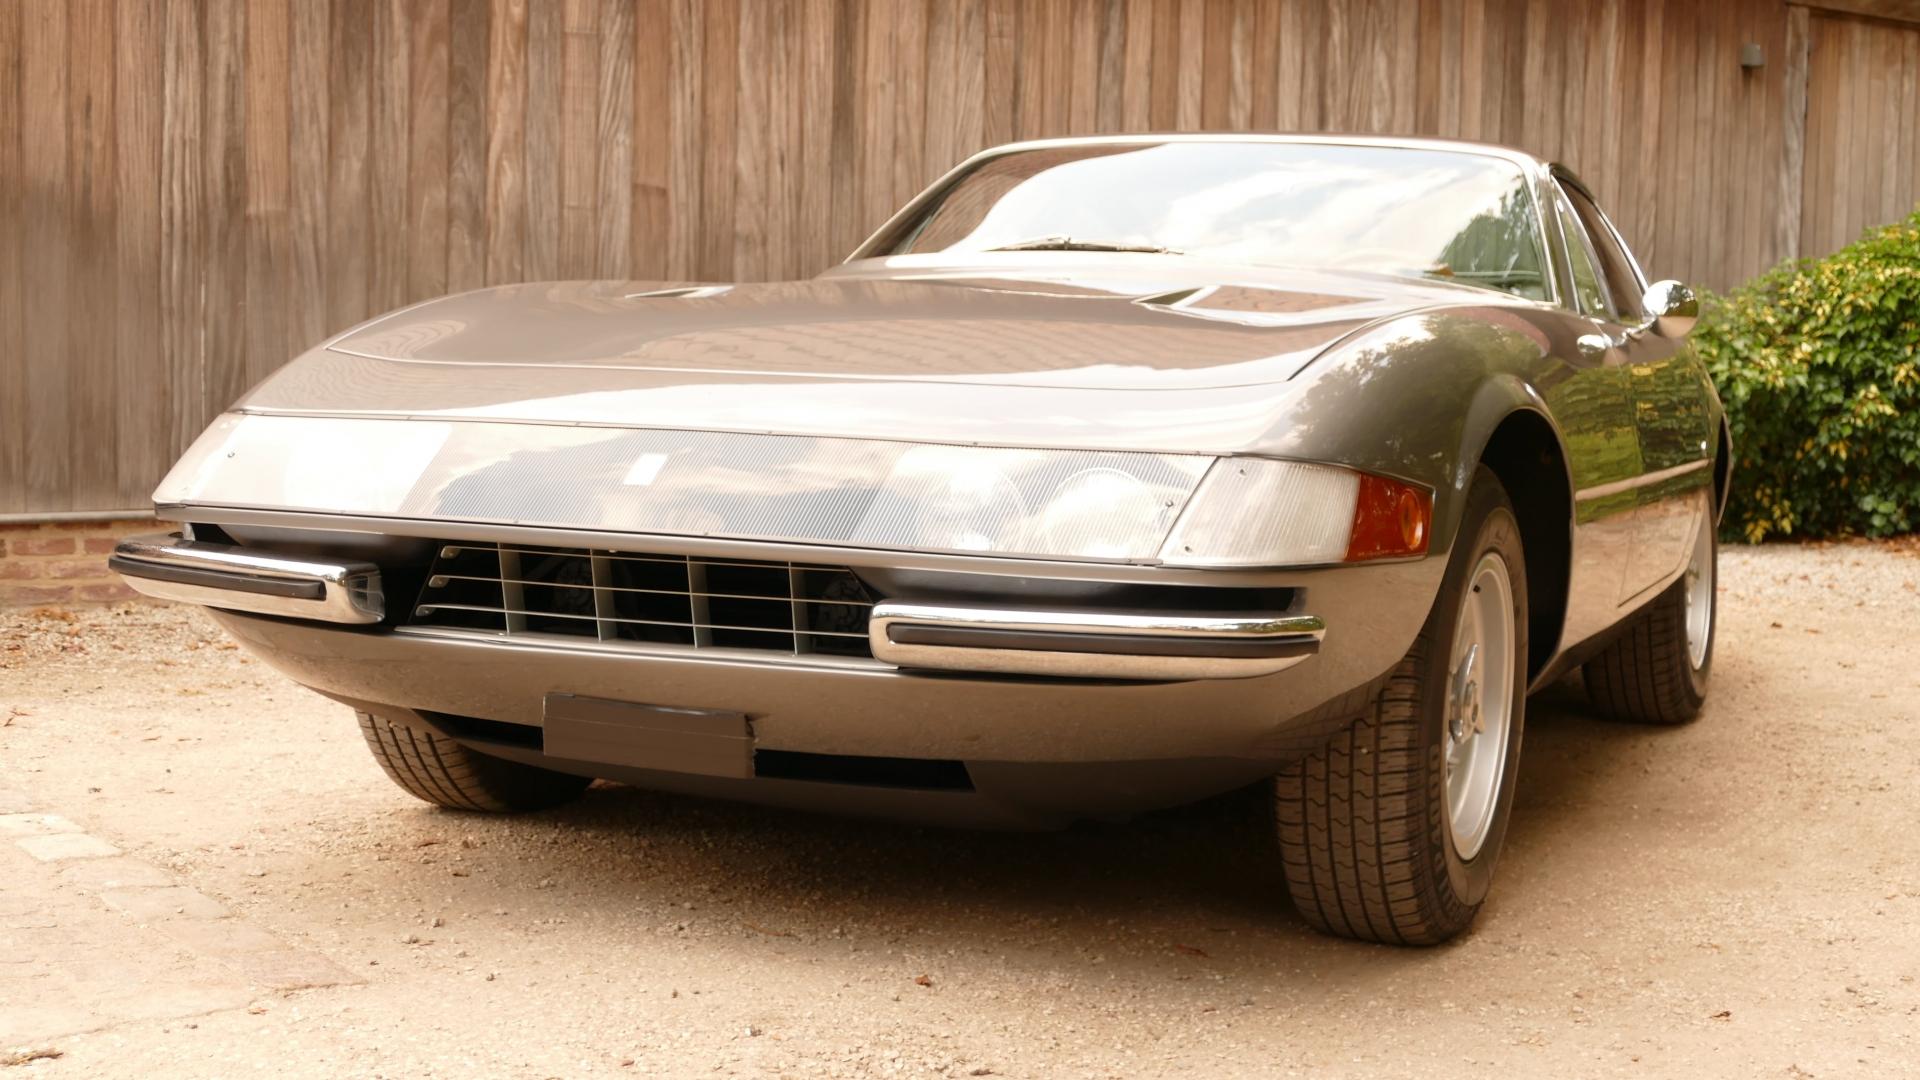 Ferrari - 365 GTB/4 Daytona · Gipimotor